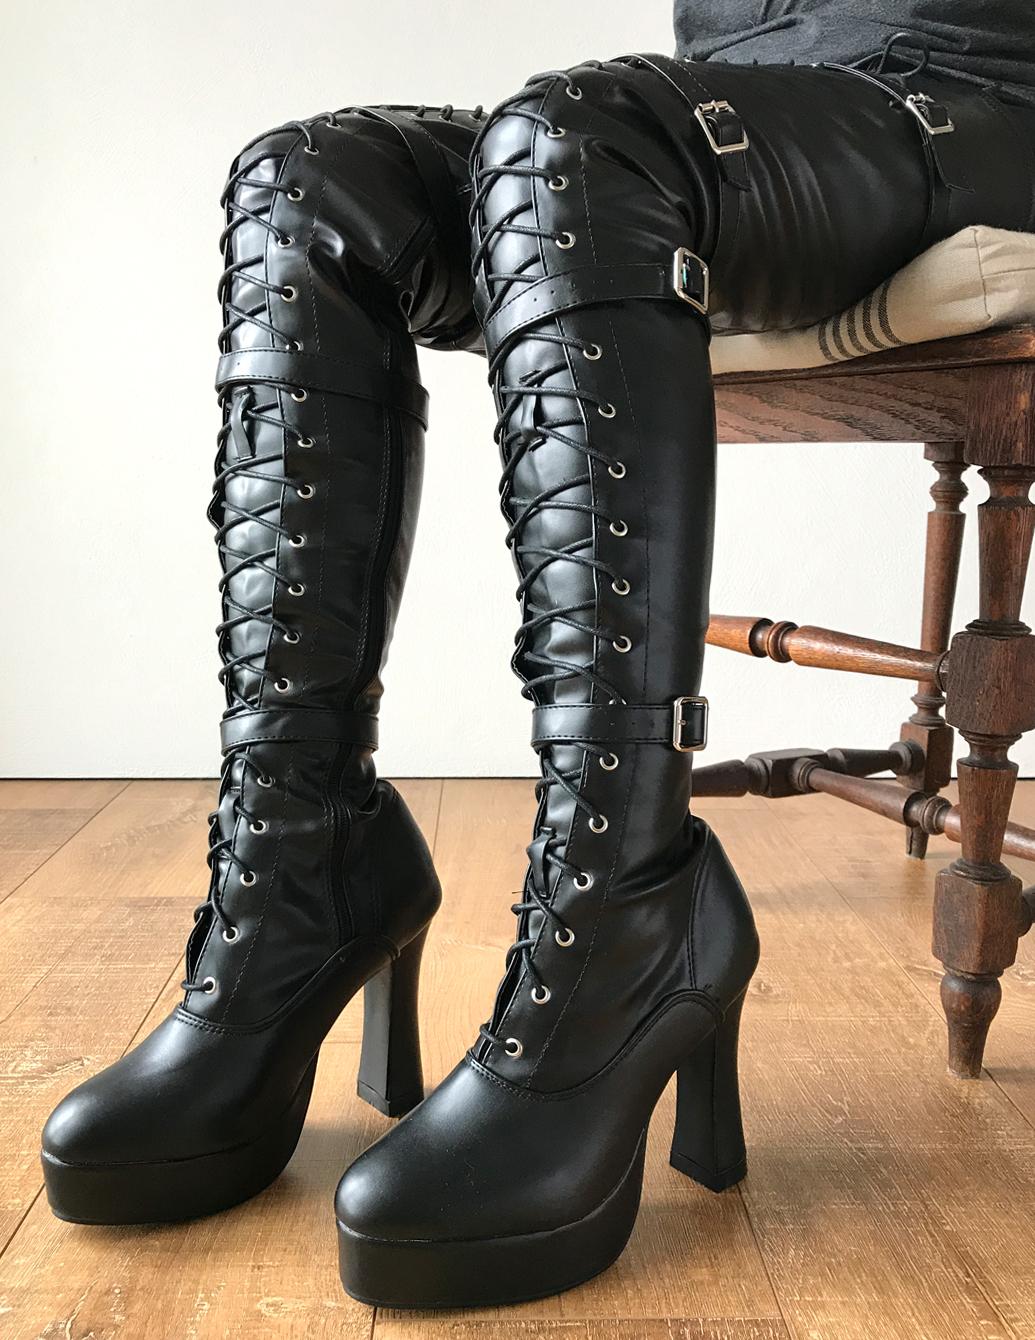 rebelsmarket_chuk_12cm_spool_heel_platform_crotch_goth_punk_pinup_cosplay_fetish_boots_boots_12.jpg